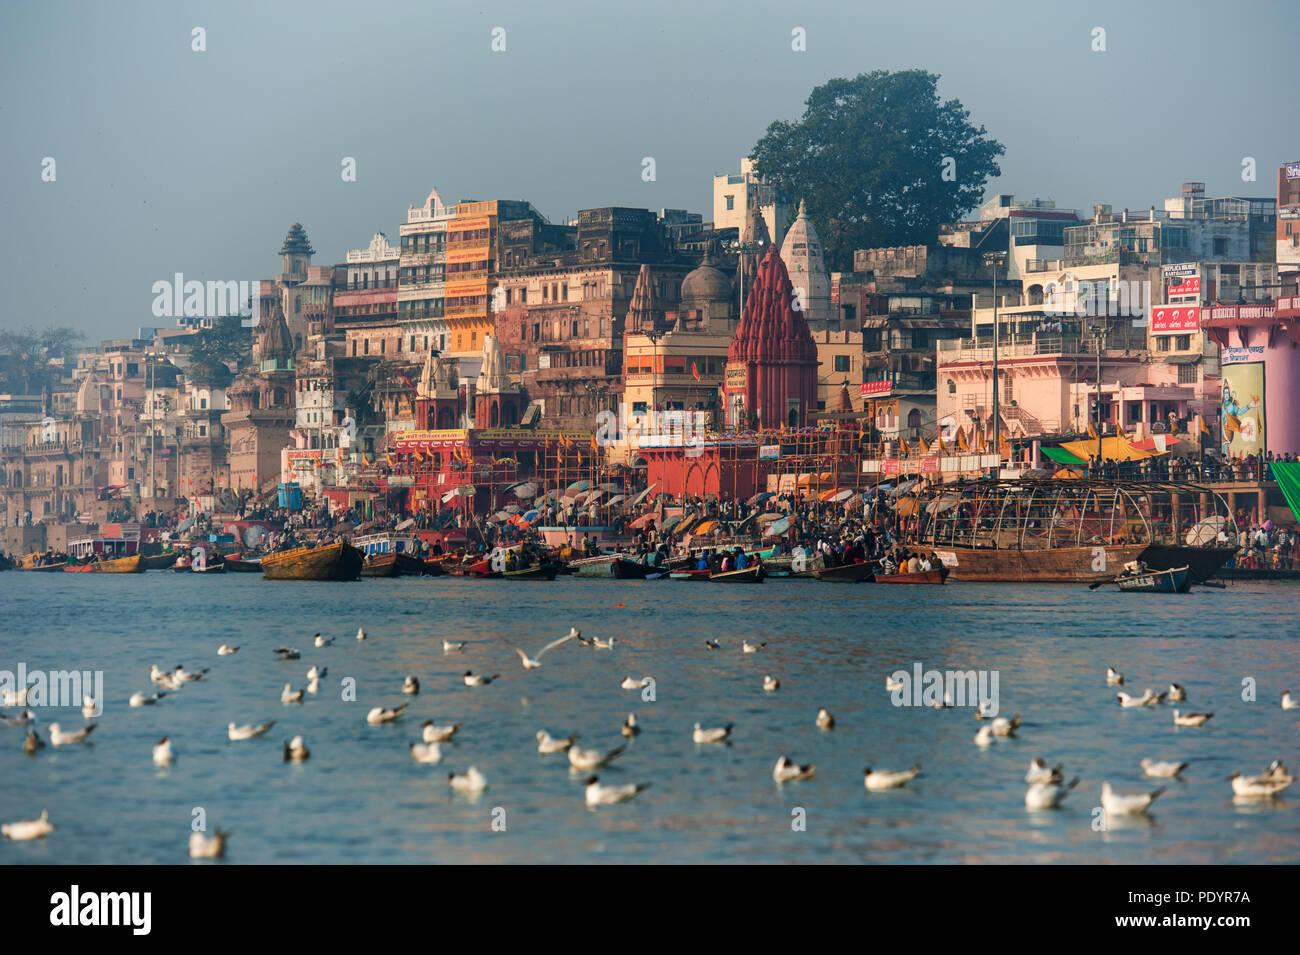 Paysage de la rivière Ganga ville sainte de Varanasi, Uttar Pradesh, Inde Photo Stock